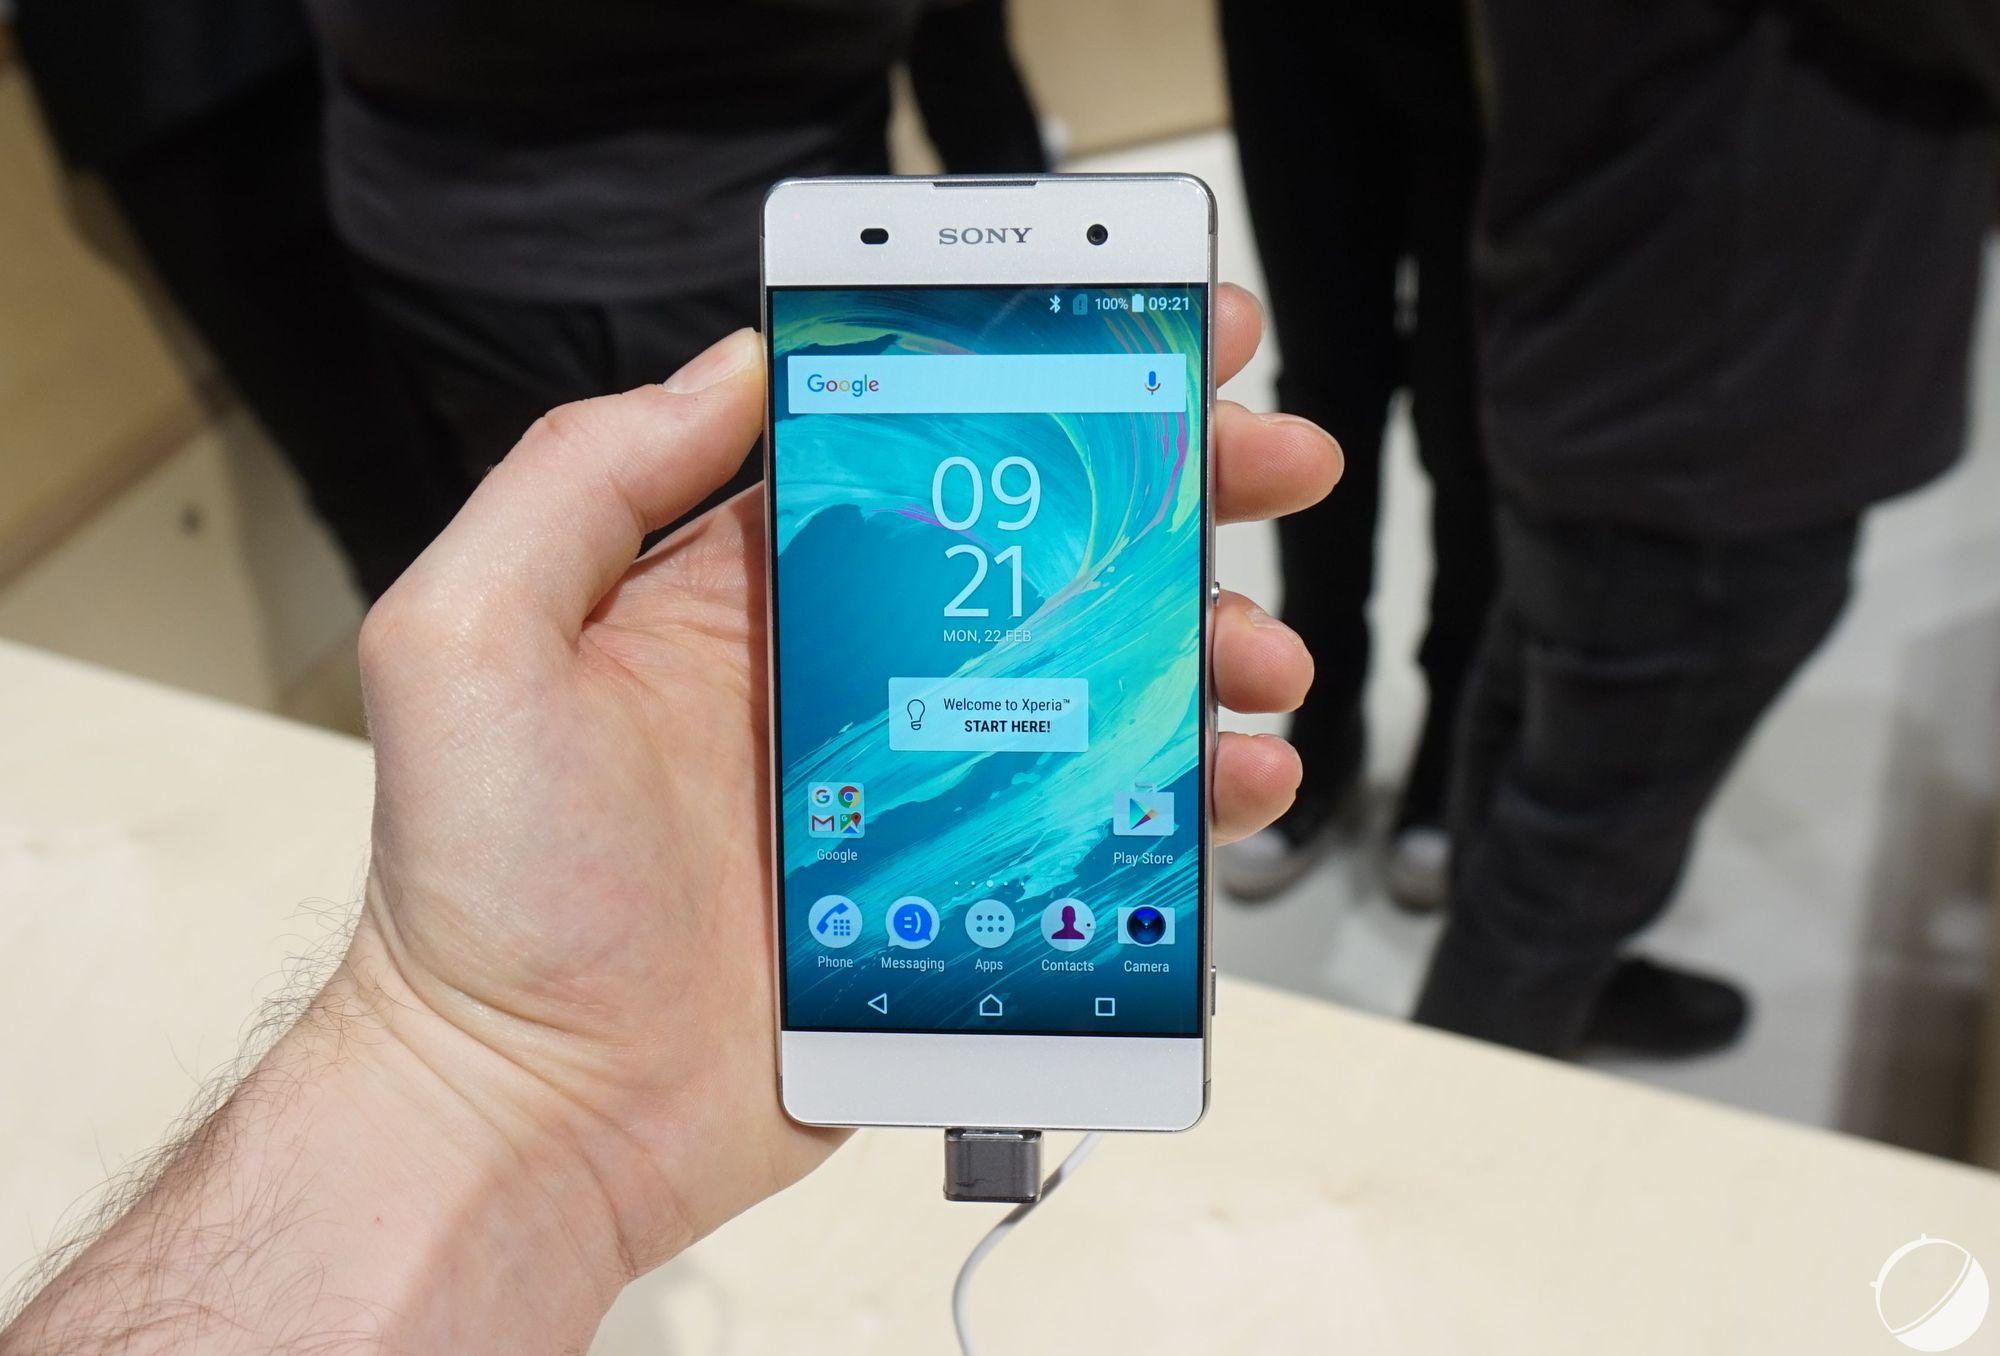 Le Sony Xperia X disponible le 20 mai, et le XA le 10 juin en Angleterre